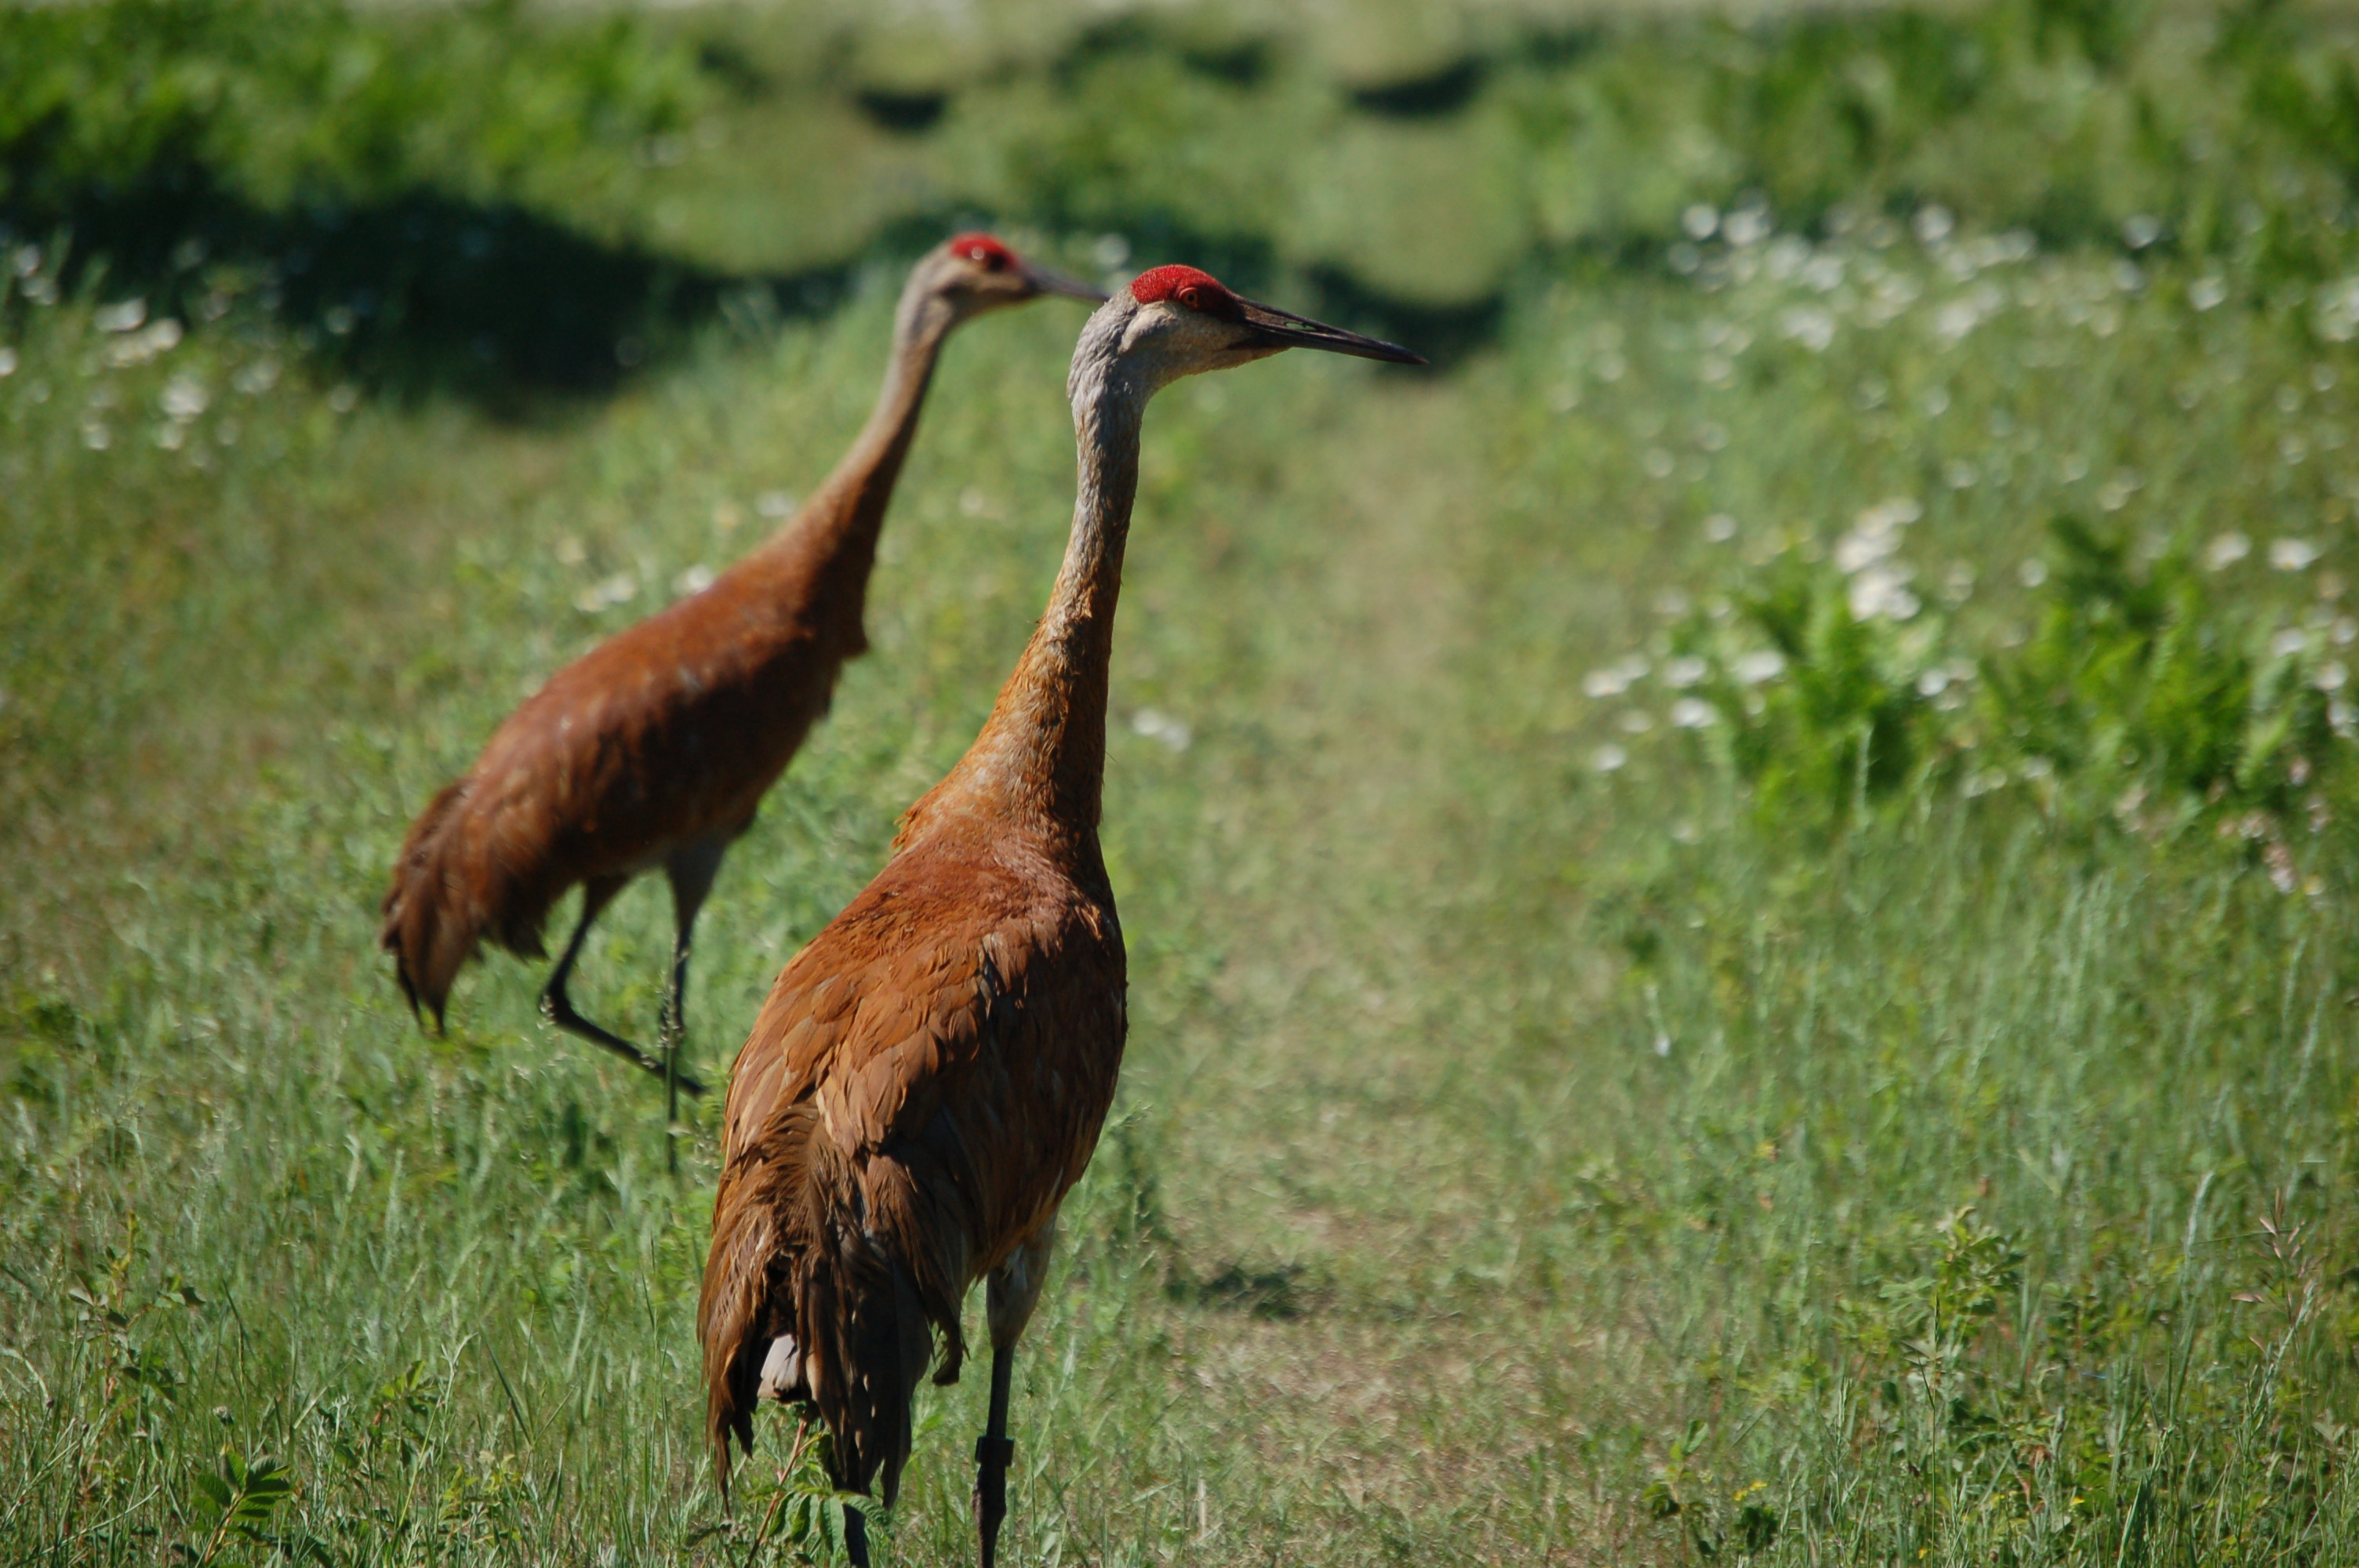 ... To View Wildlife in Michigan's Upper Peninsula - Travel the Mitten